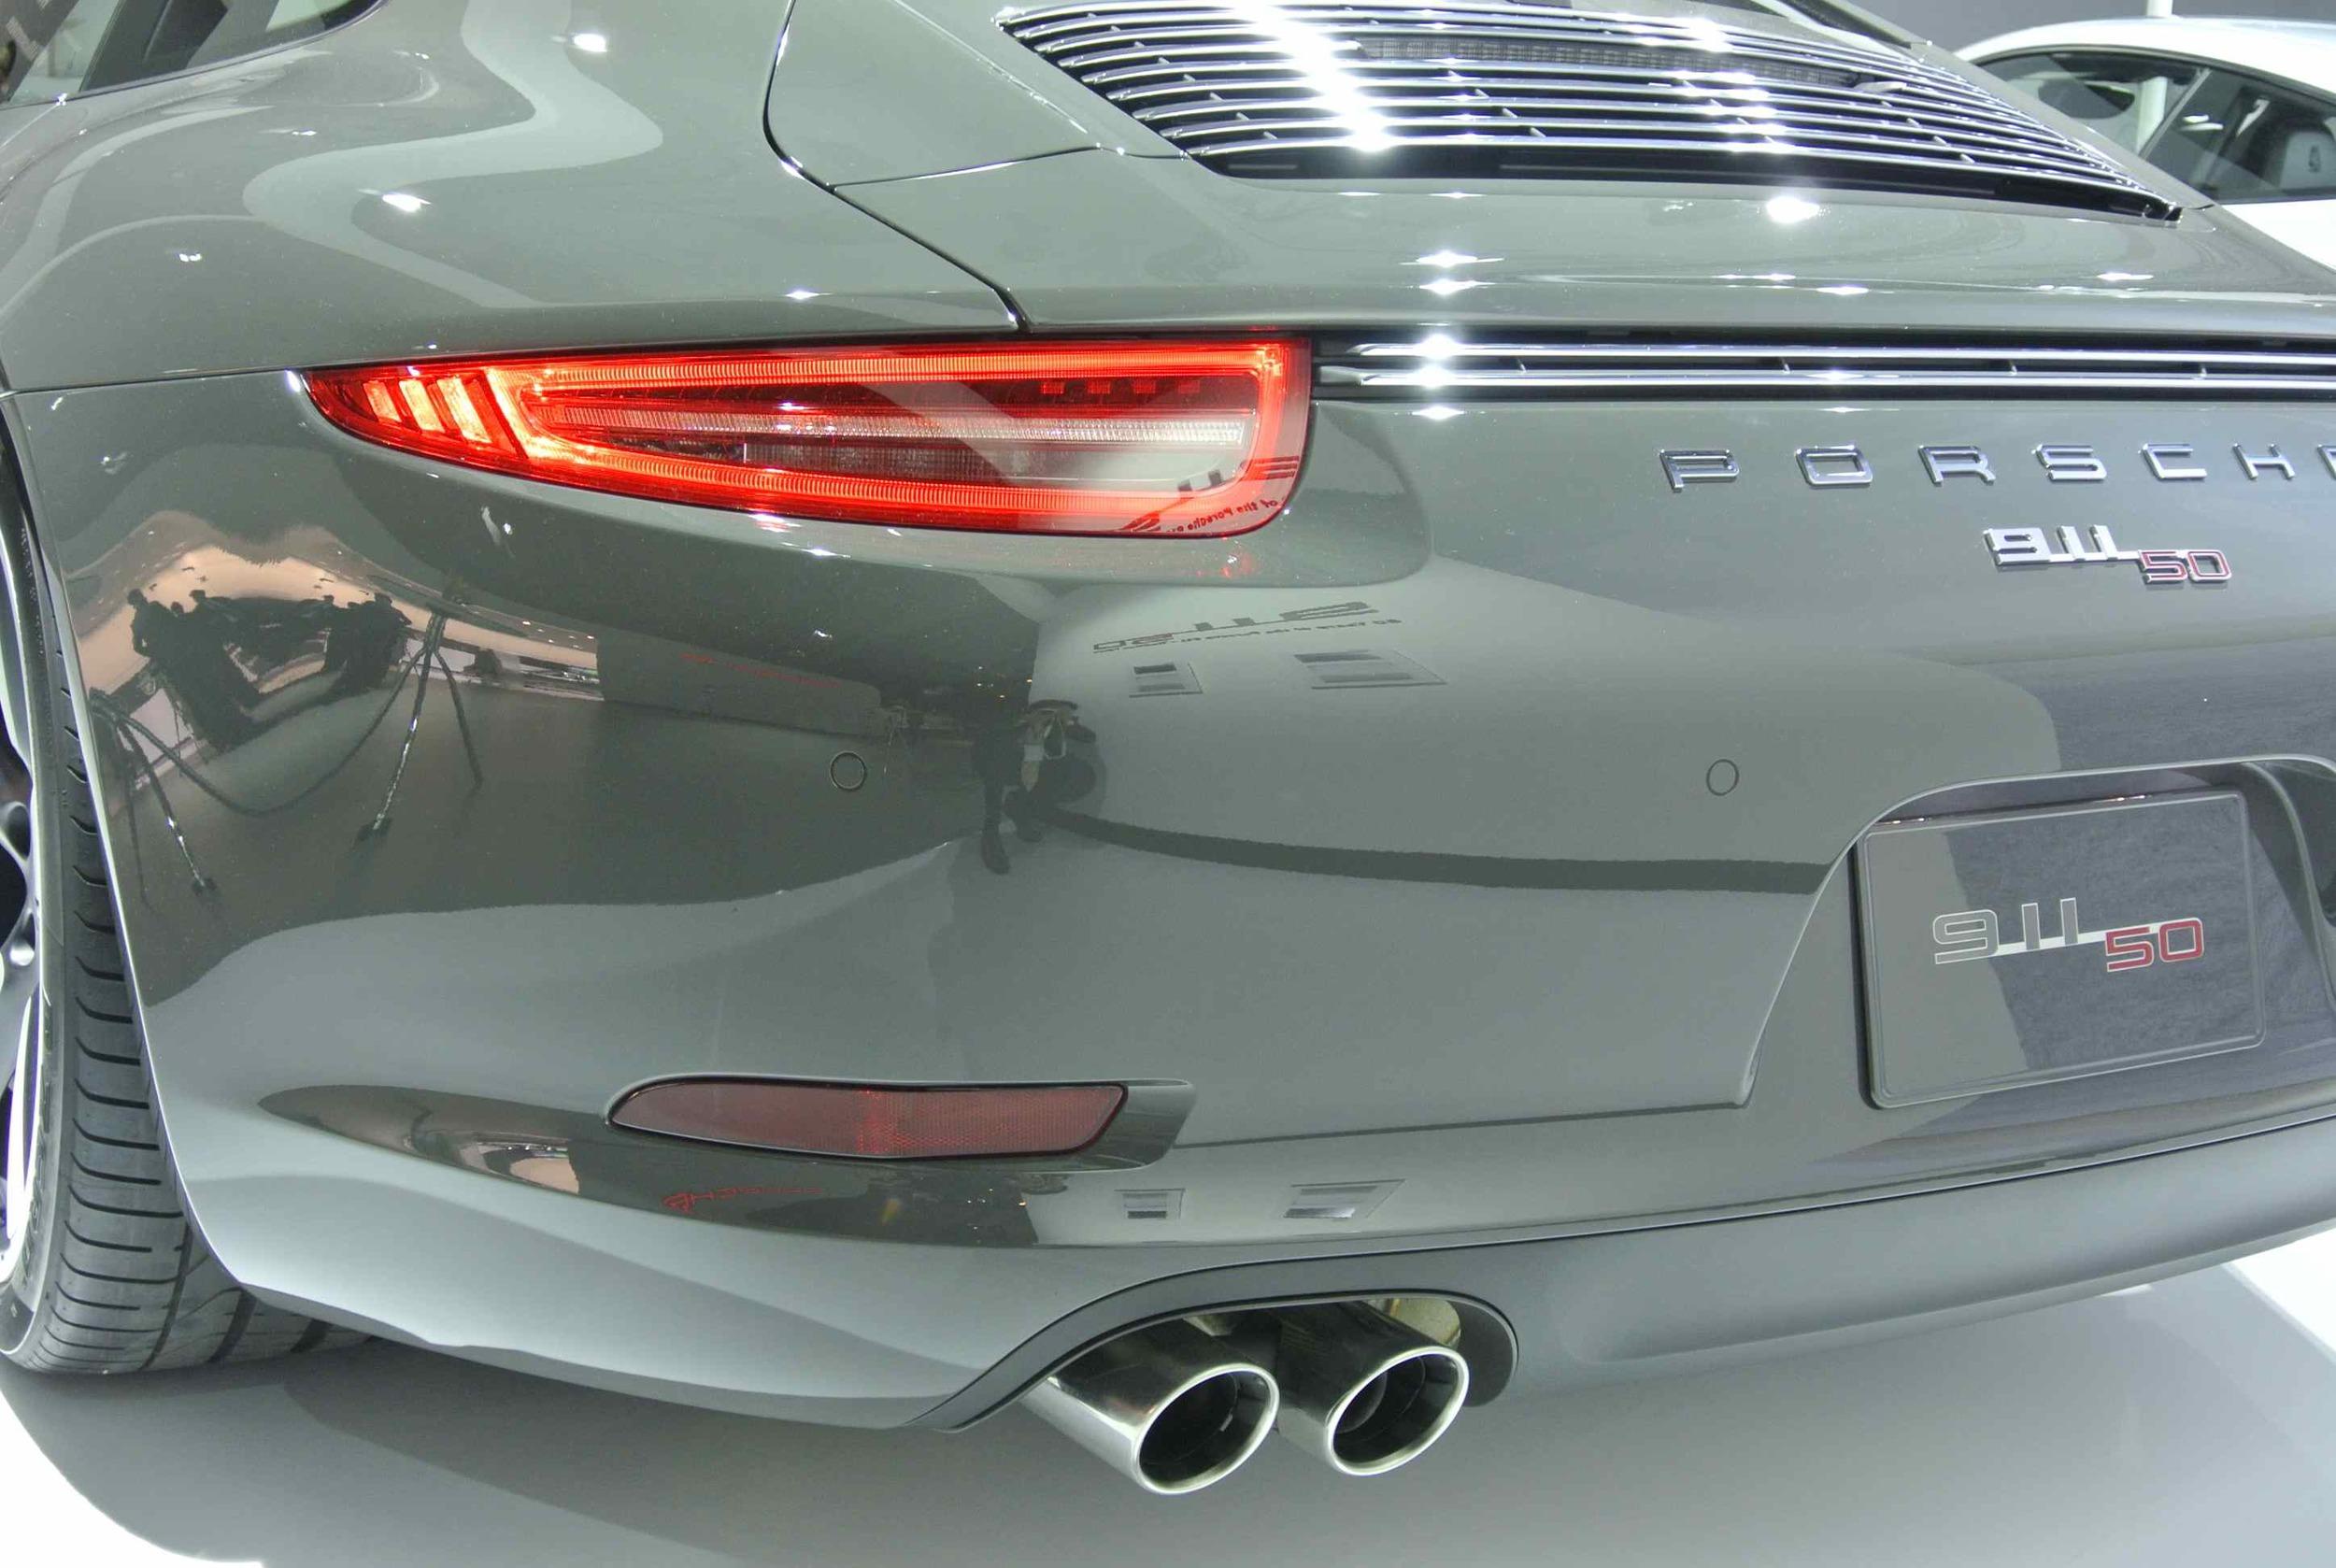 Porsche91150thRearDetail1.jpg